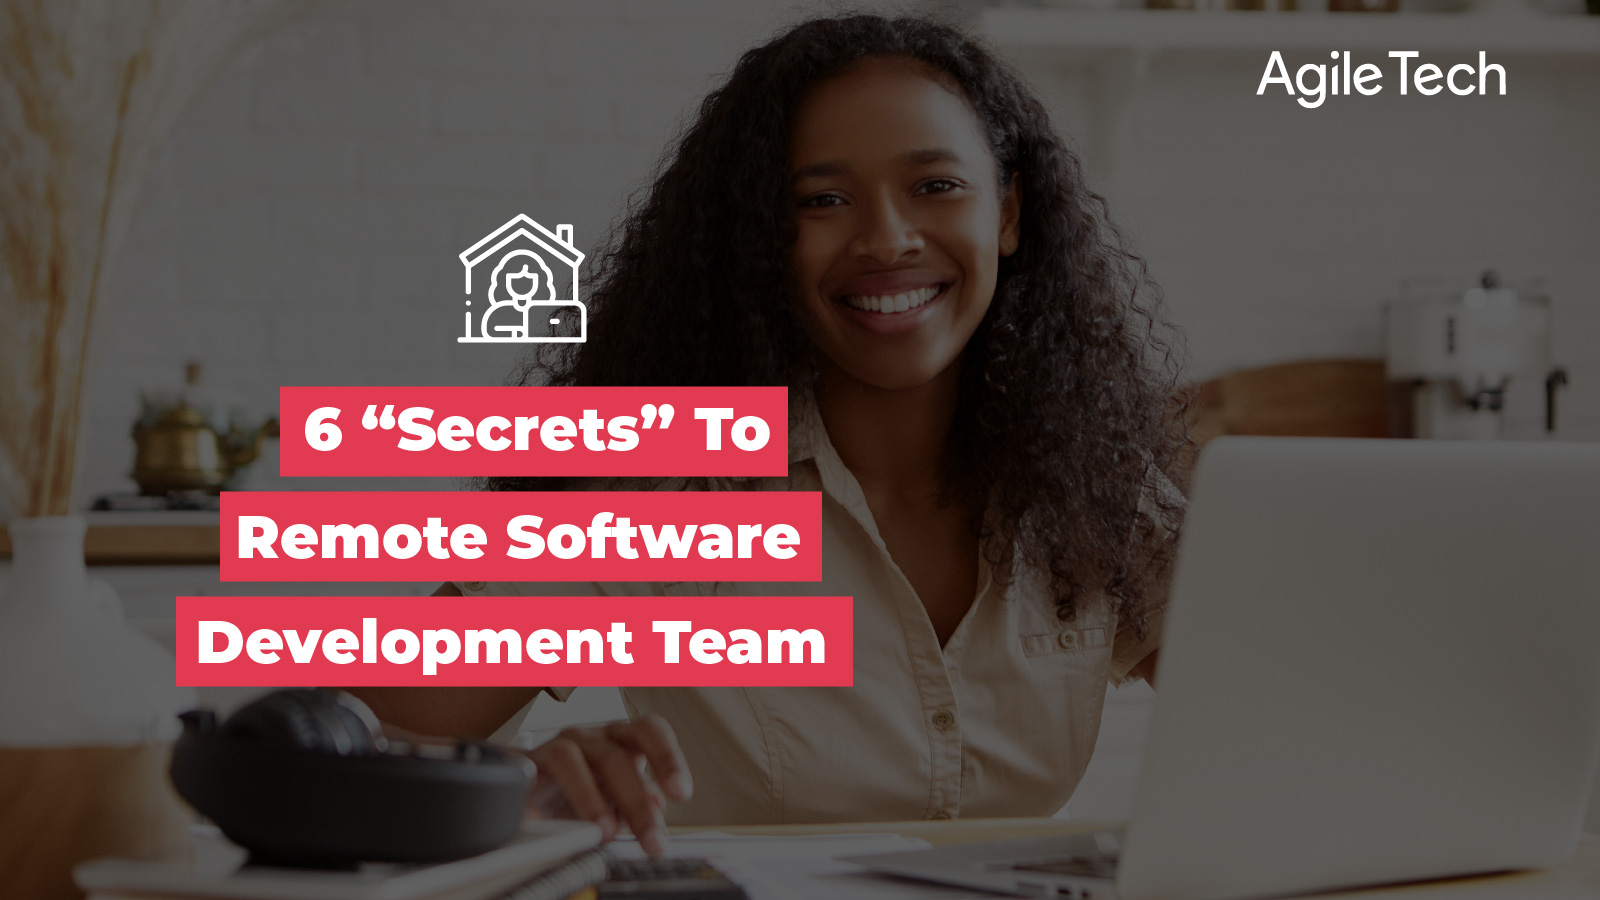 secrets to remote software development team, tips to working remotely for software development team, agiletech